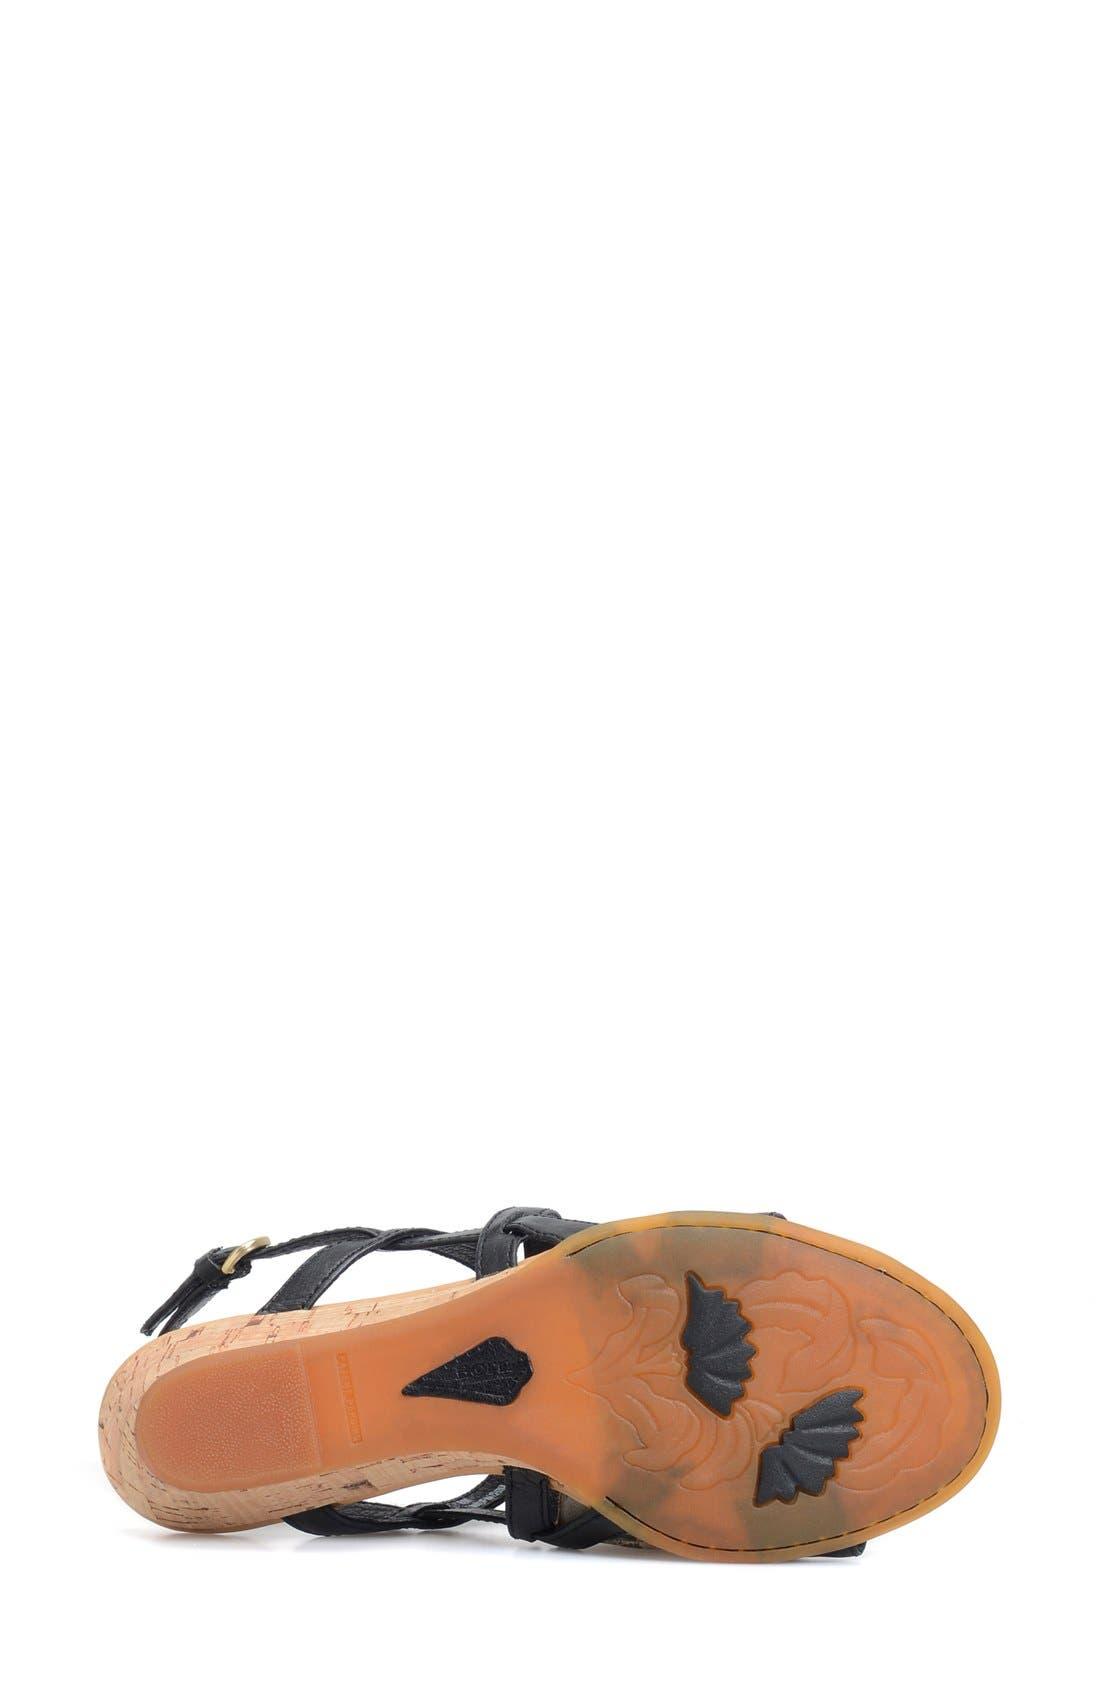 BØRN,                             'Porta' Low Wedge Sandal,                             Alternate thumbnail 2, color,                             001